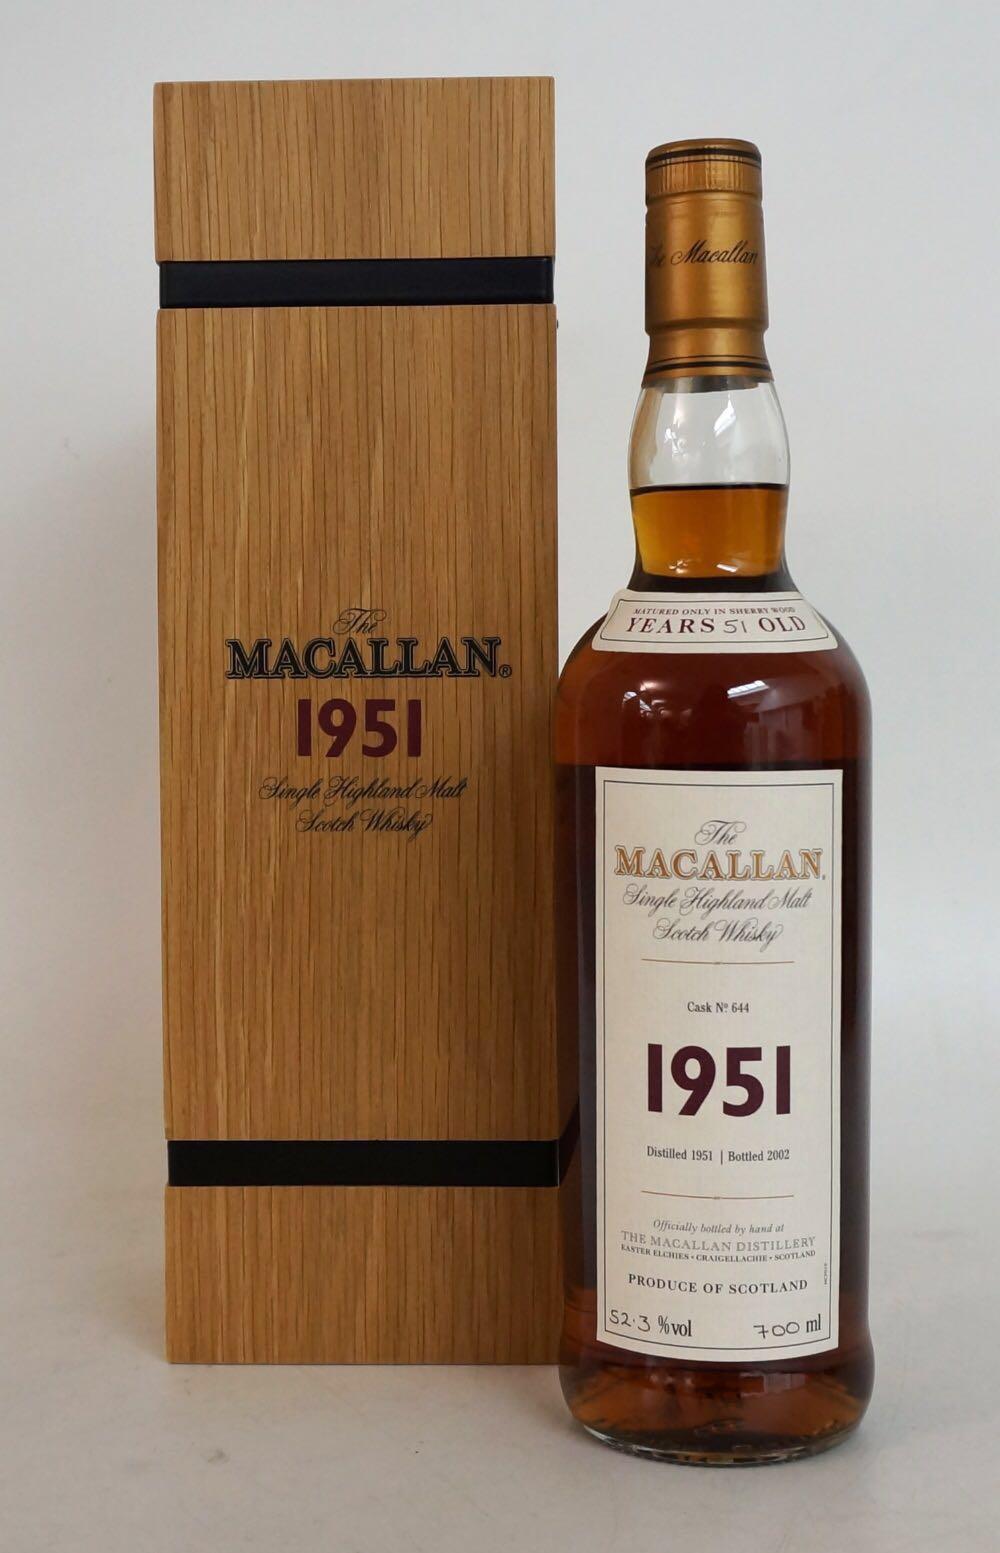 Macallan Rare Cask - Batch No. 1 - 2019 Release - Whisky